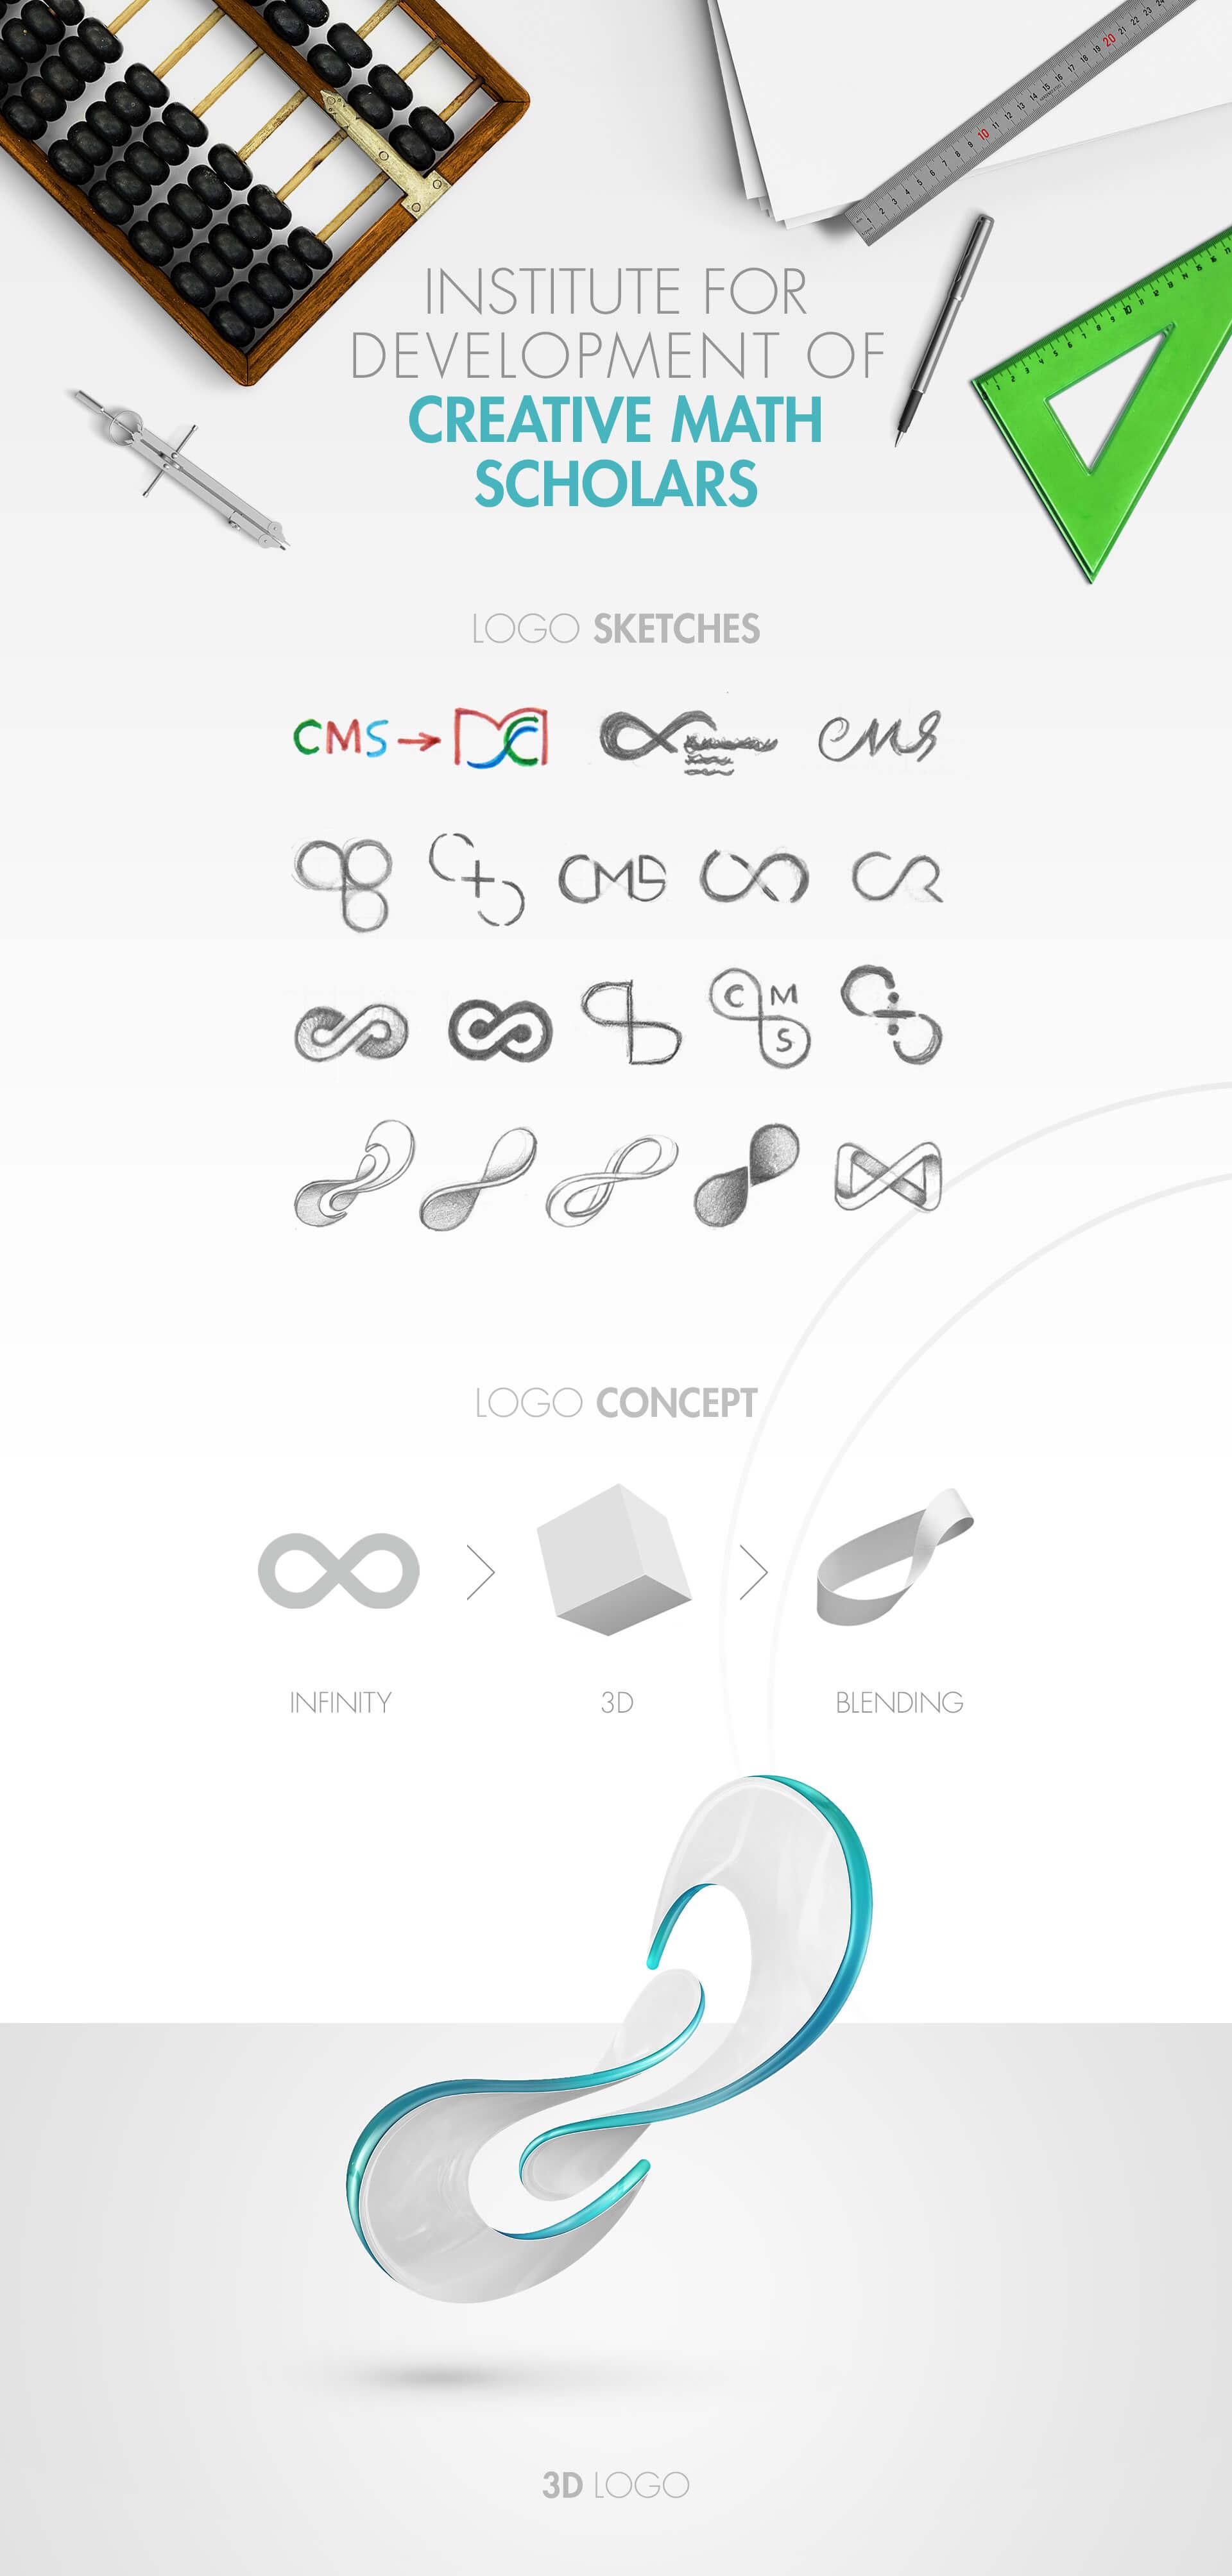 هویت بصری موسسه ریاضی پژوهان خلاق ، هویت بصری، طراحی لوگو، طراحی لوگوتایپ، طراحی ست اداری، طراحی اوراق اداری، شرکت تبلیغاتی الف، طراحی هویت بصری